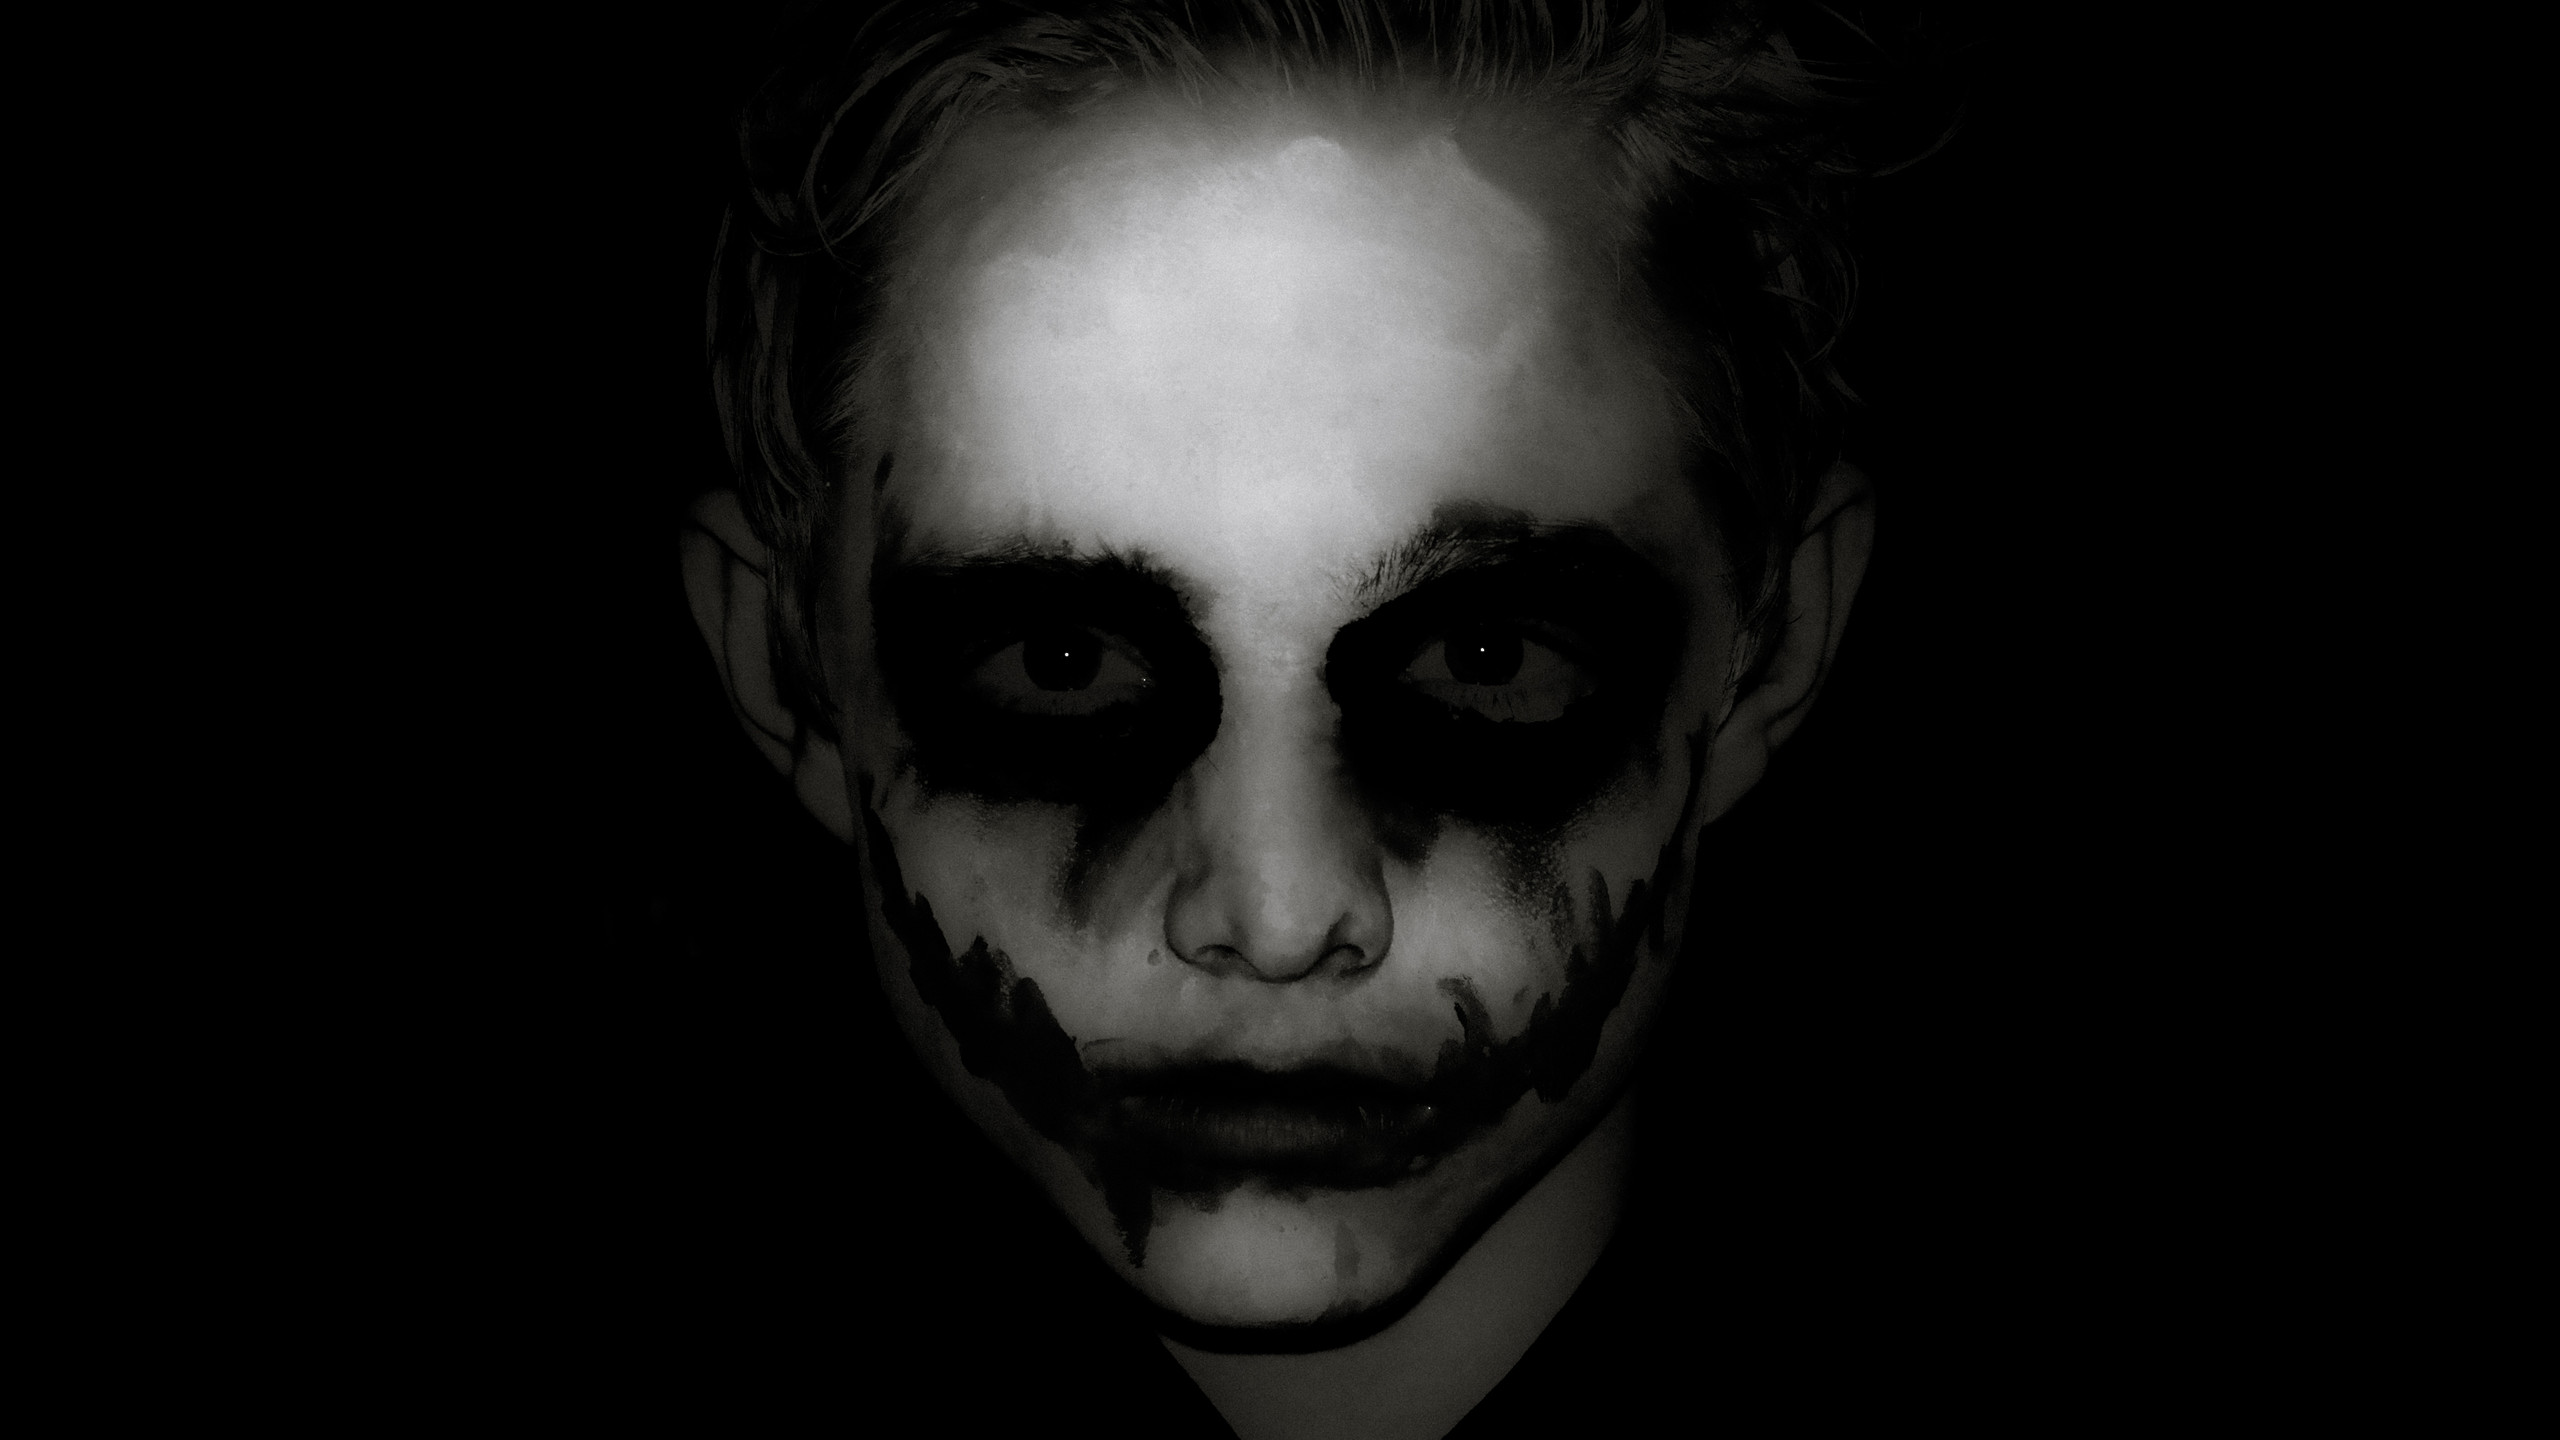 Thomas - The horror boy III